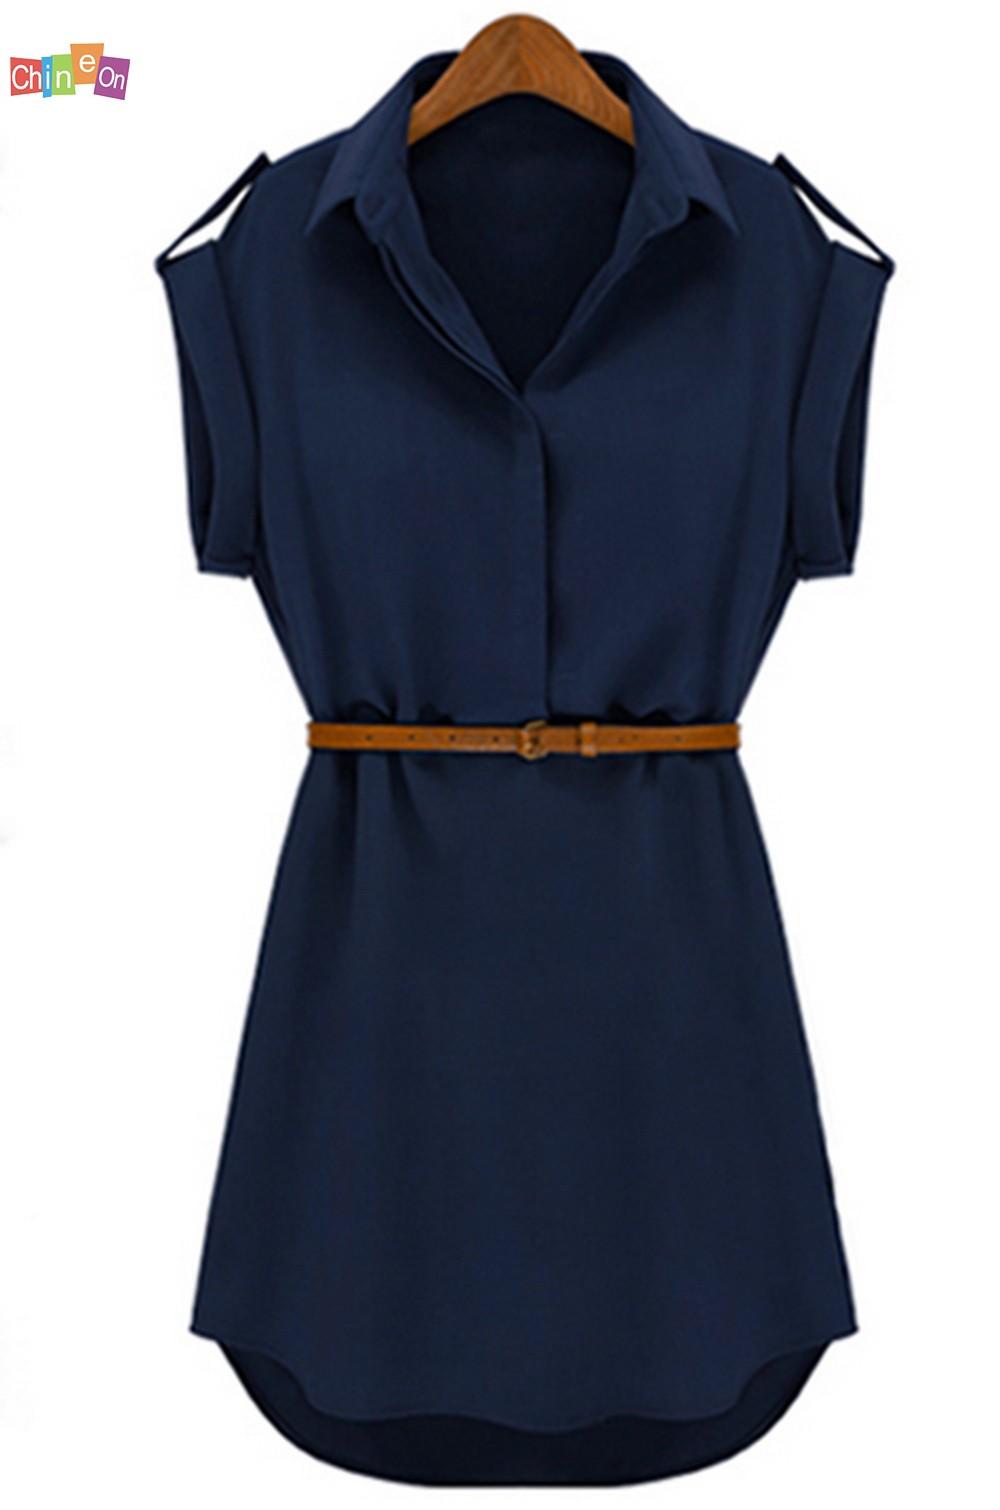 Cheap Shirt Dress Chiffon Find Shirt Dress Chiffon Deals On Line At